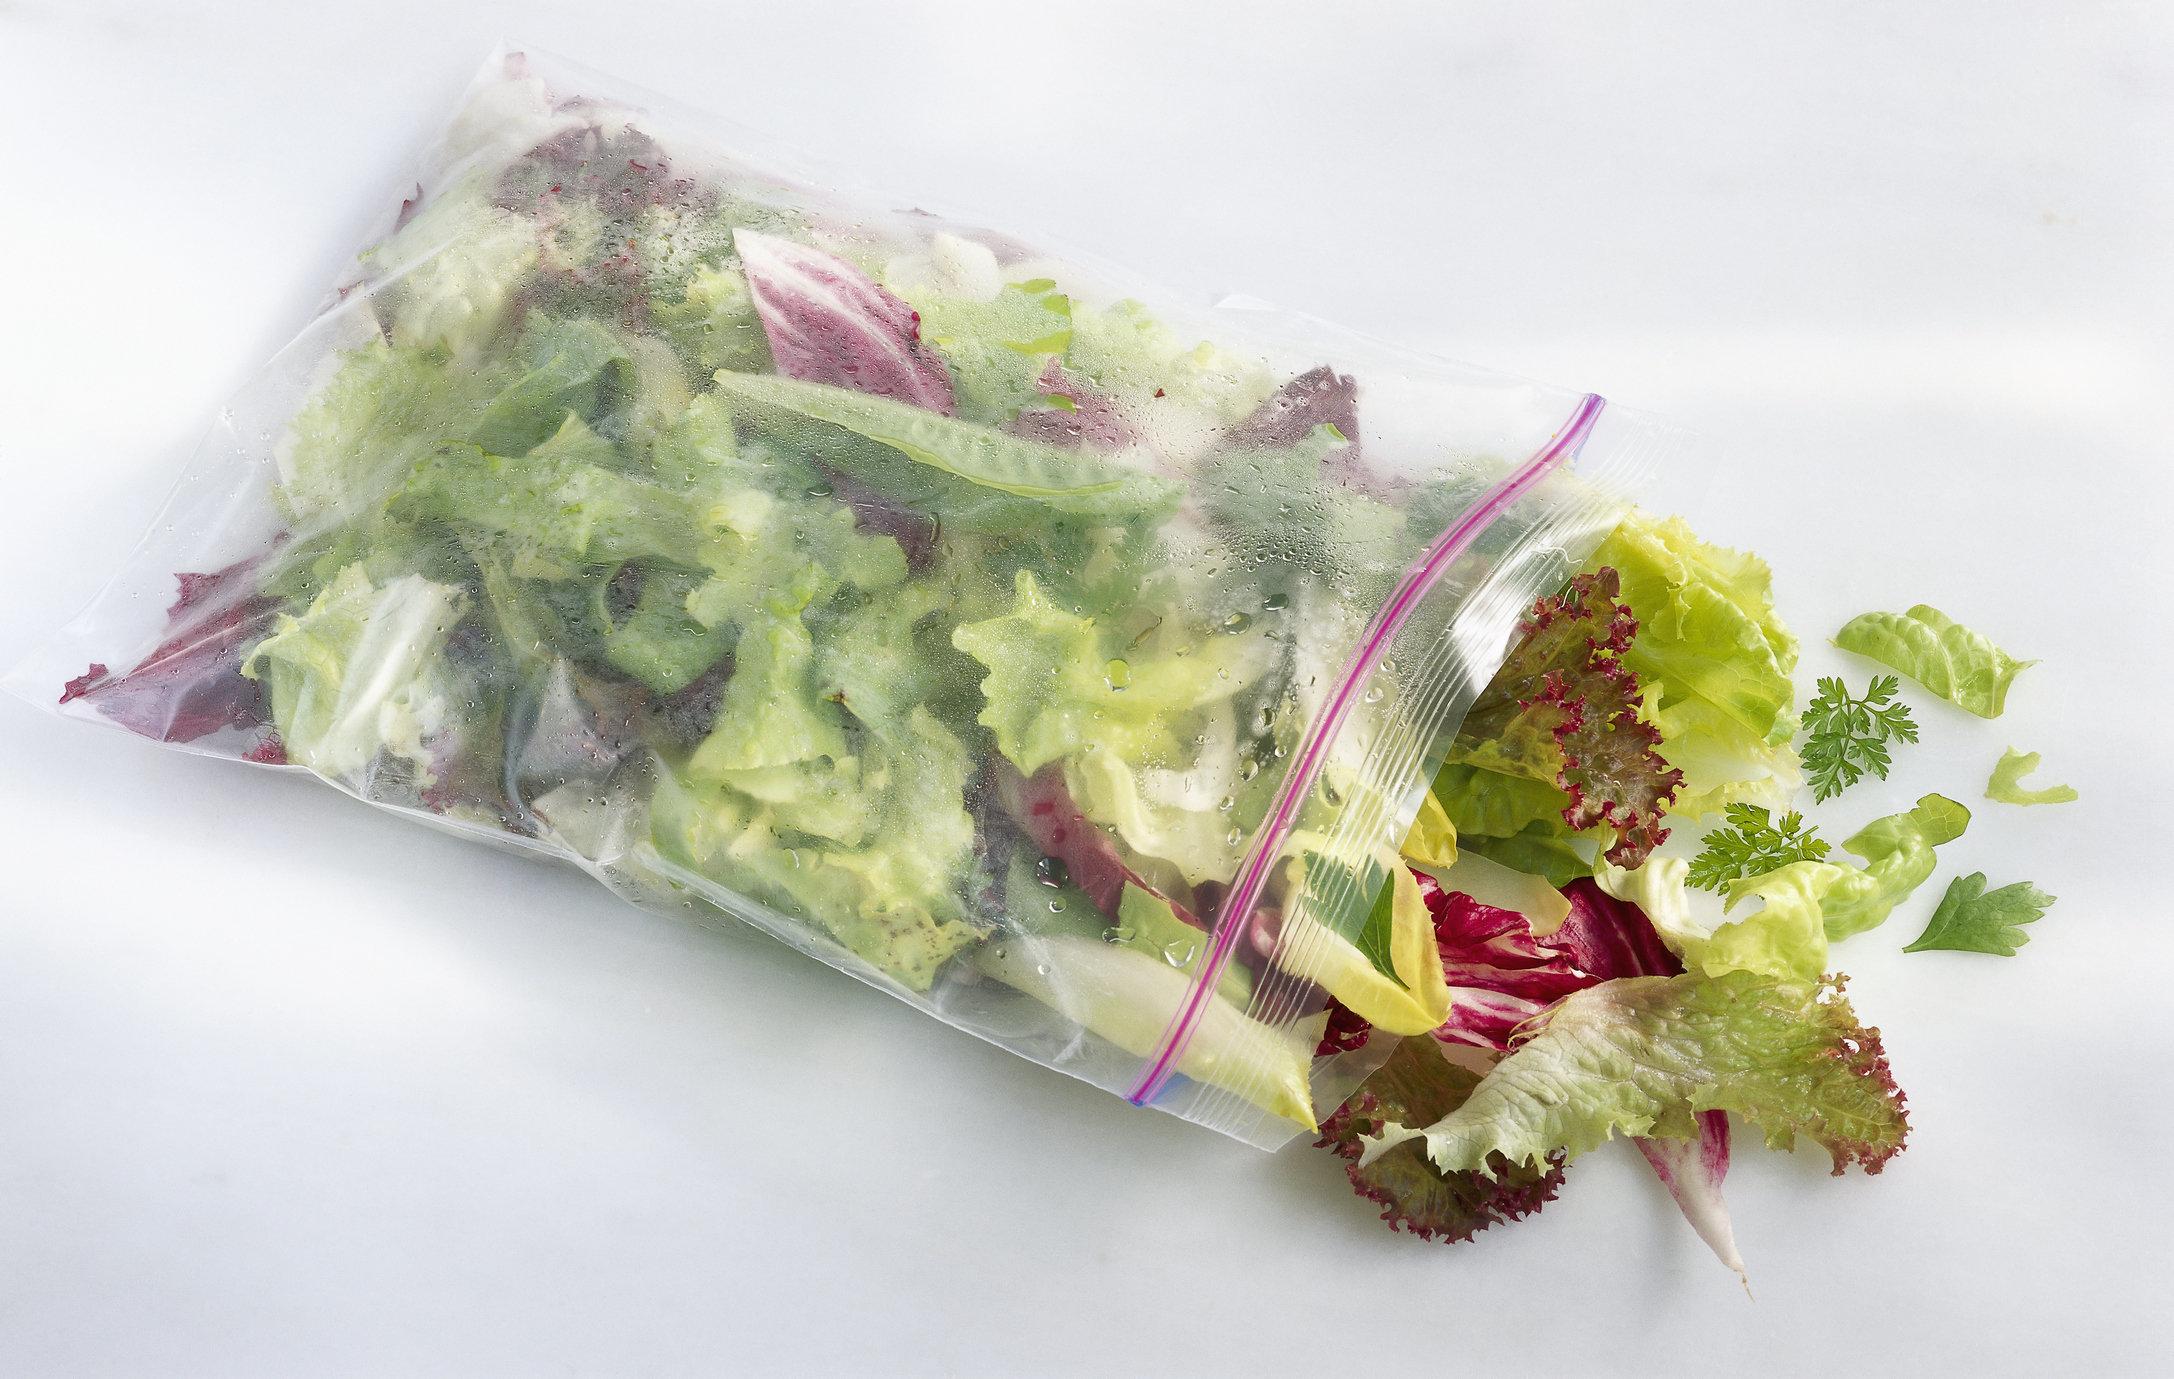 Assorted lettuce in plastic bag, studio shot